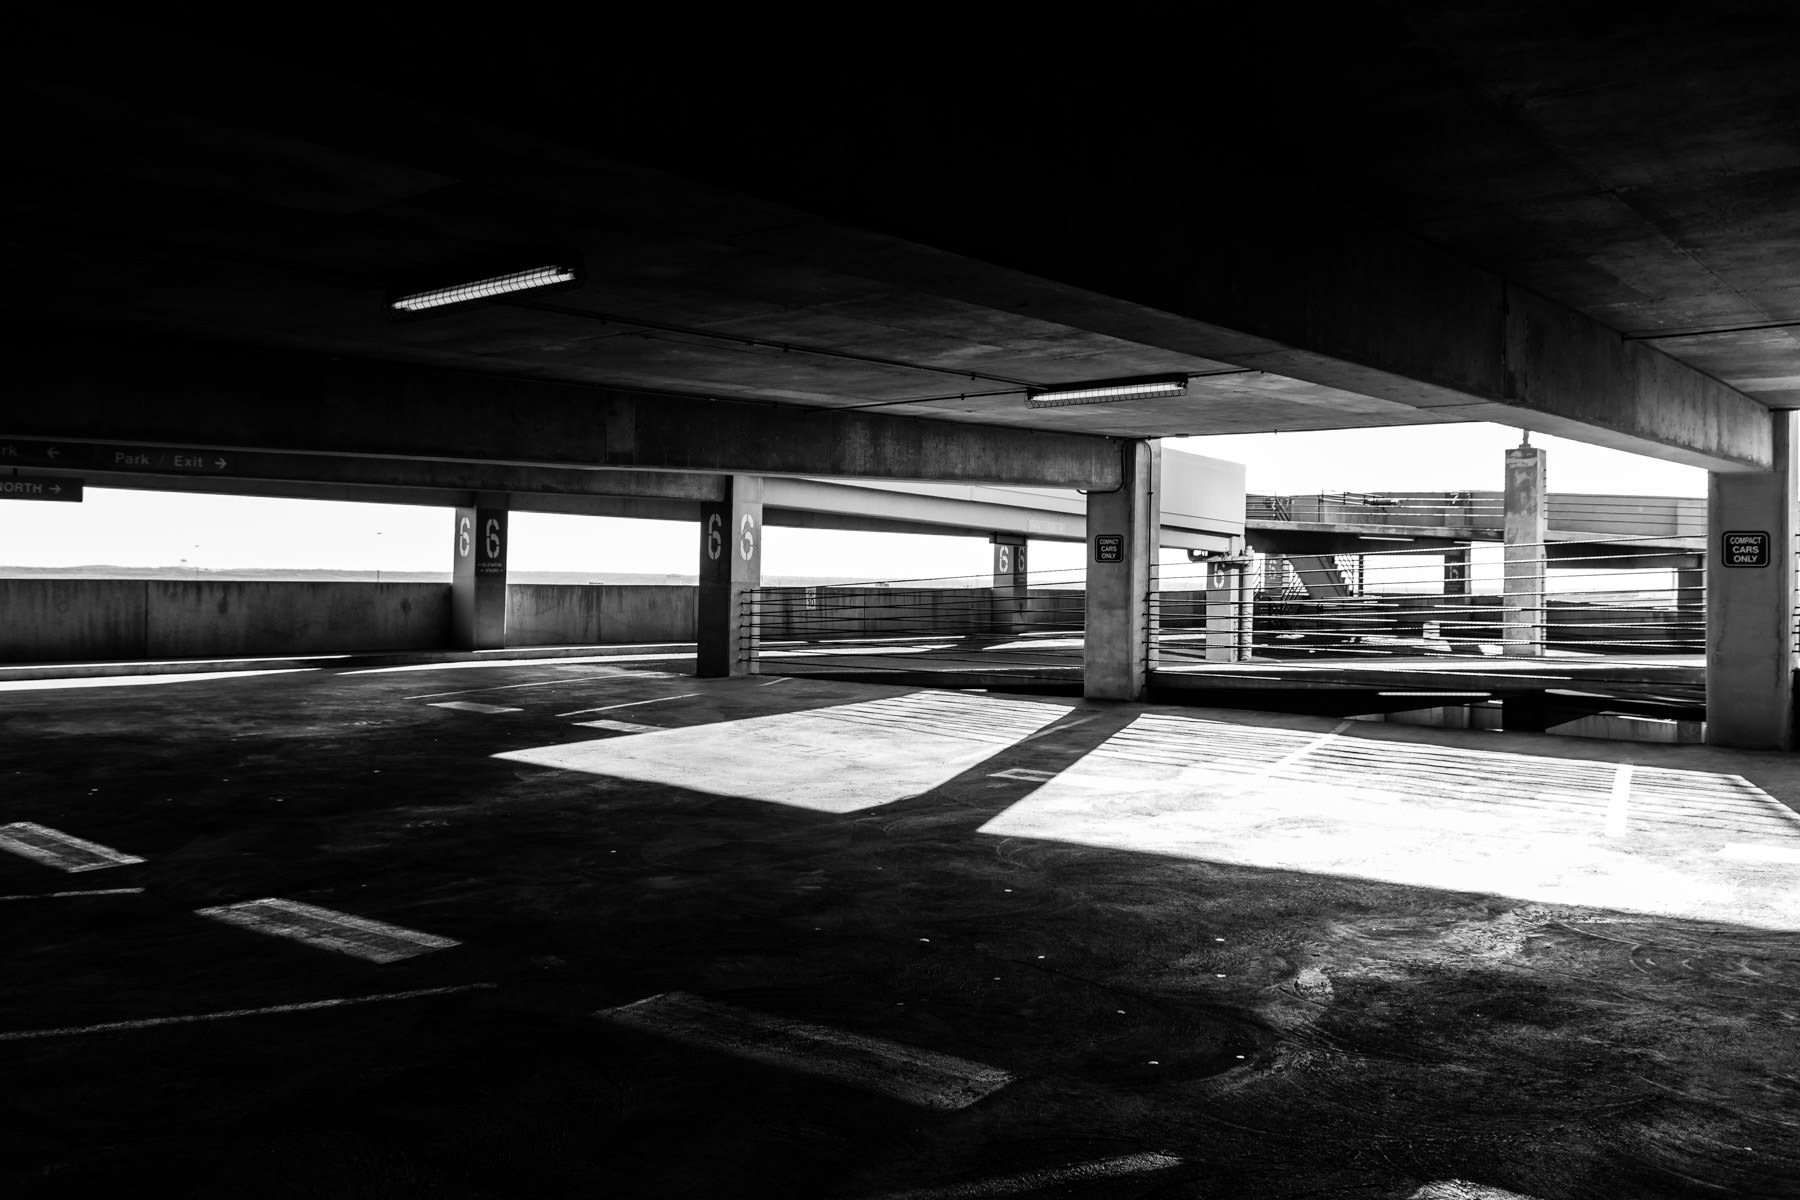 The Empty Garage  DallasFort Worth  75CentralPhotography